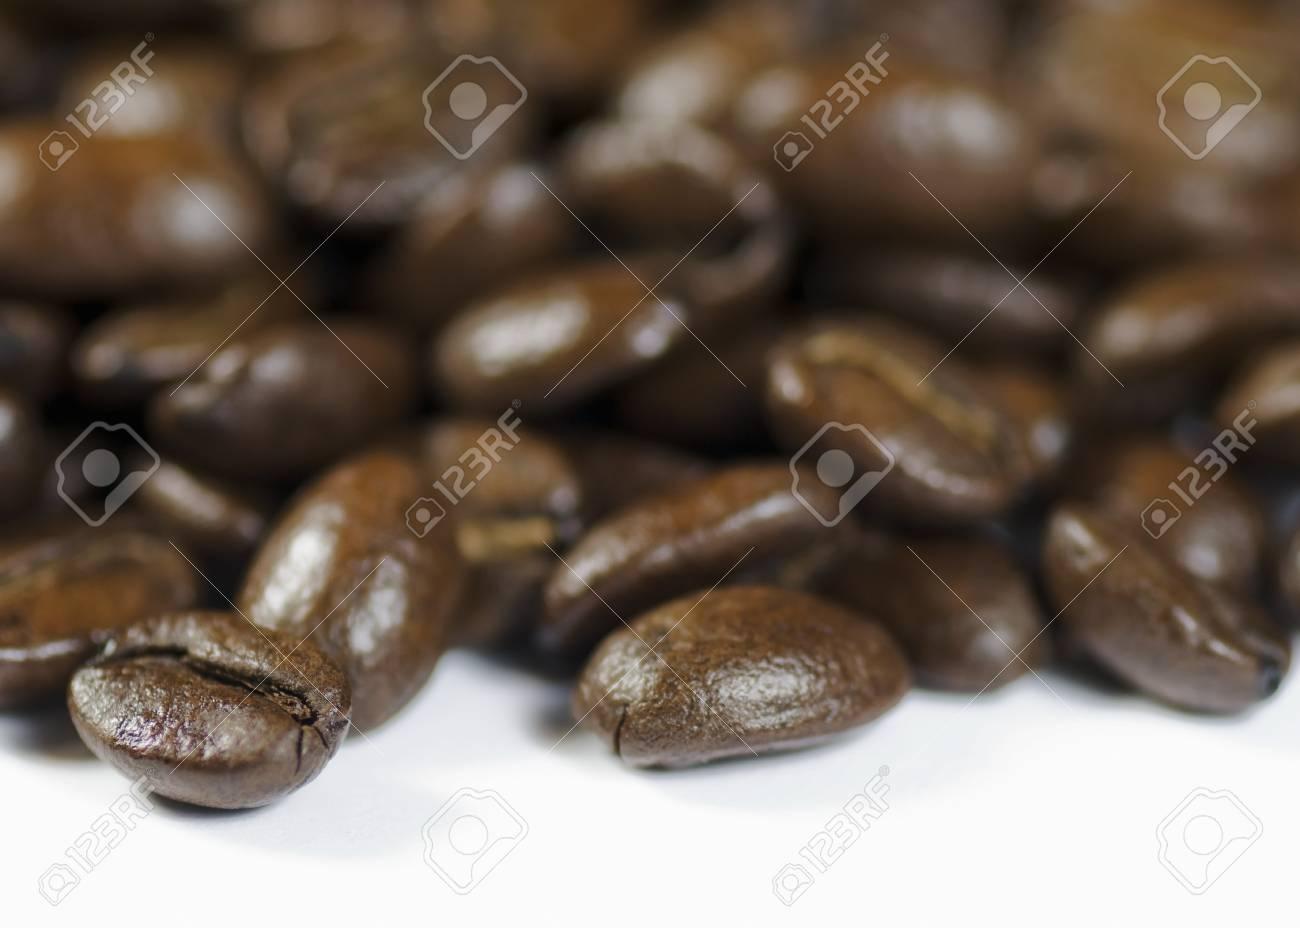 Coffee beans on white background Stock Photo - 8278846